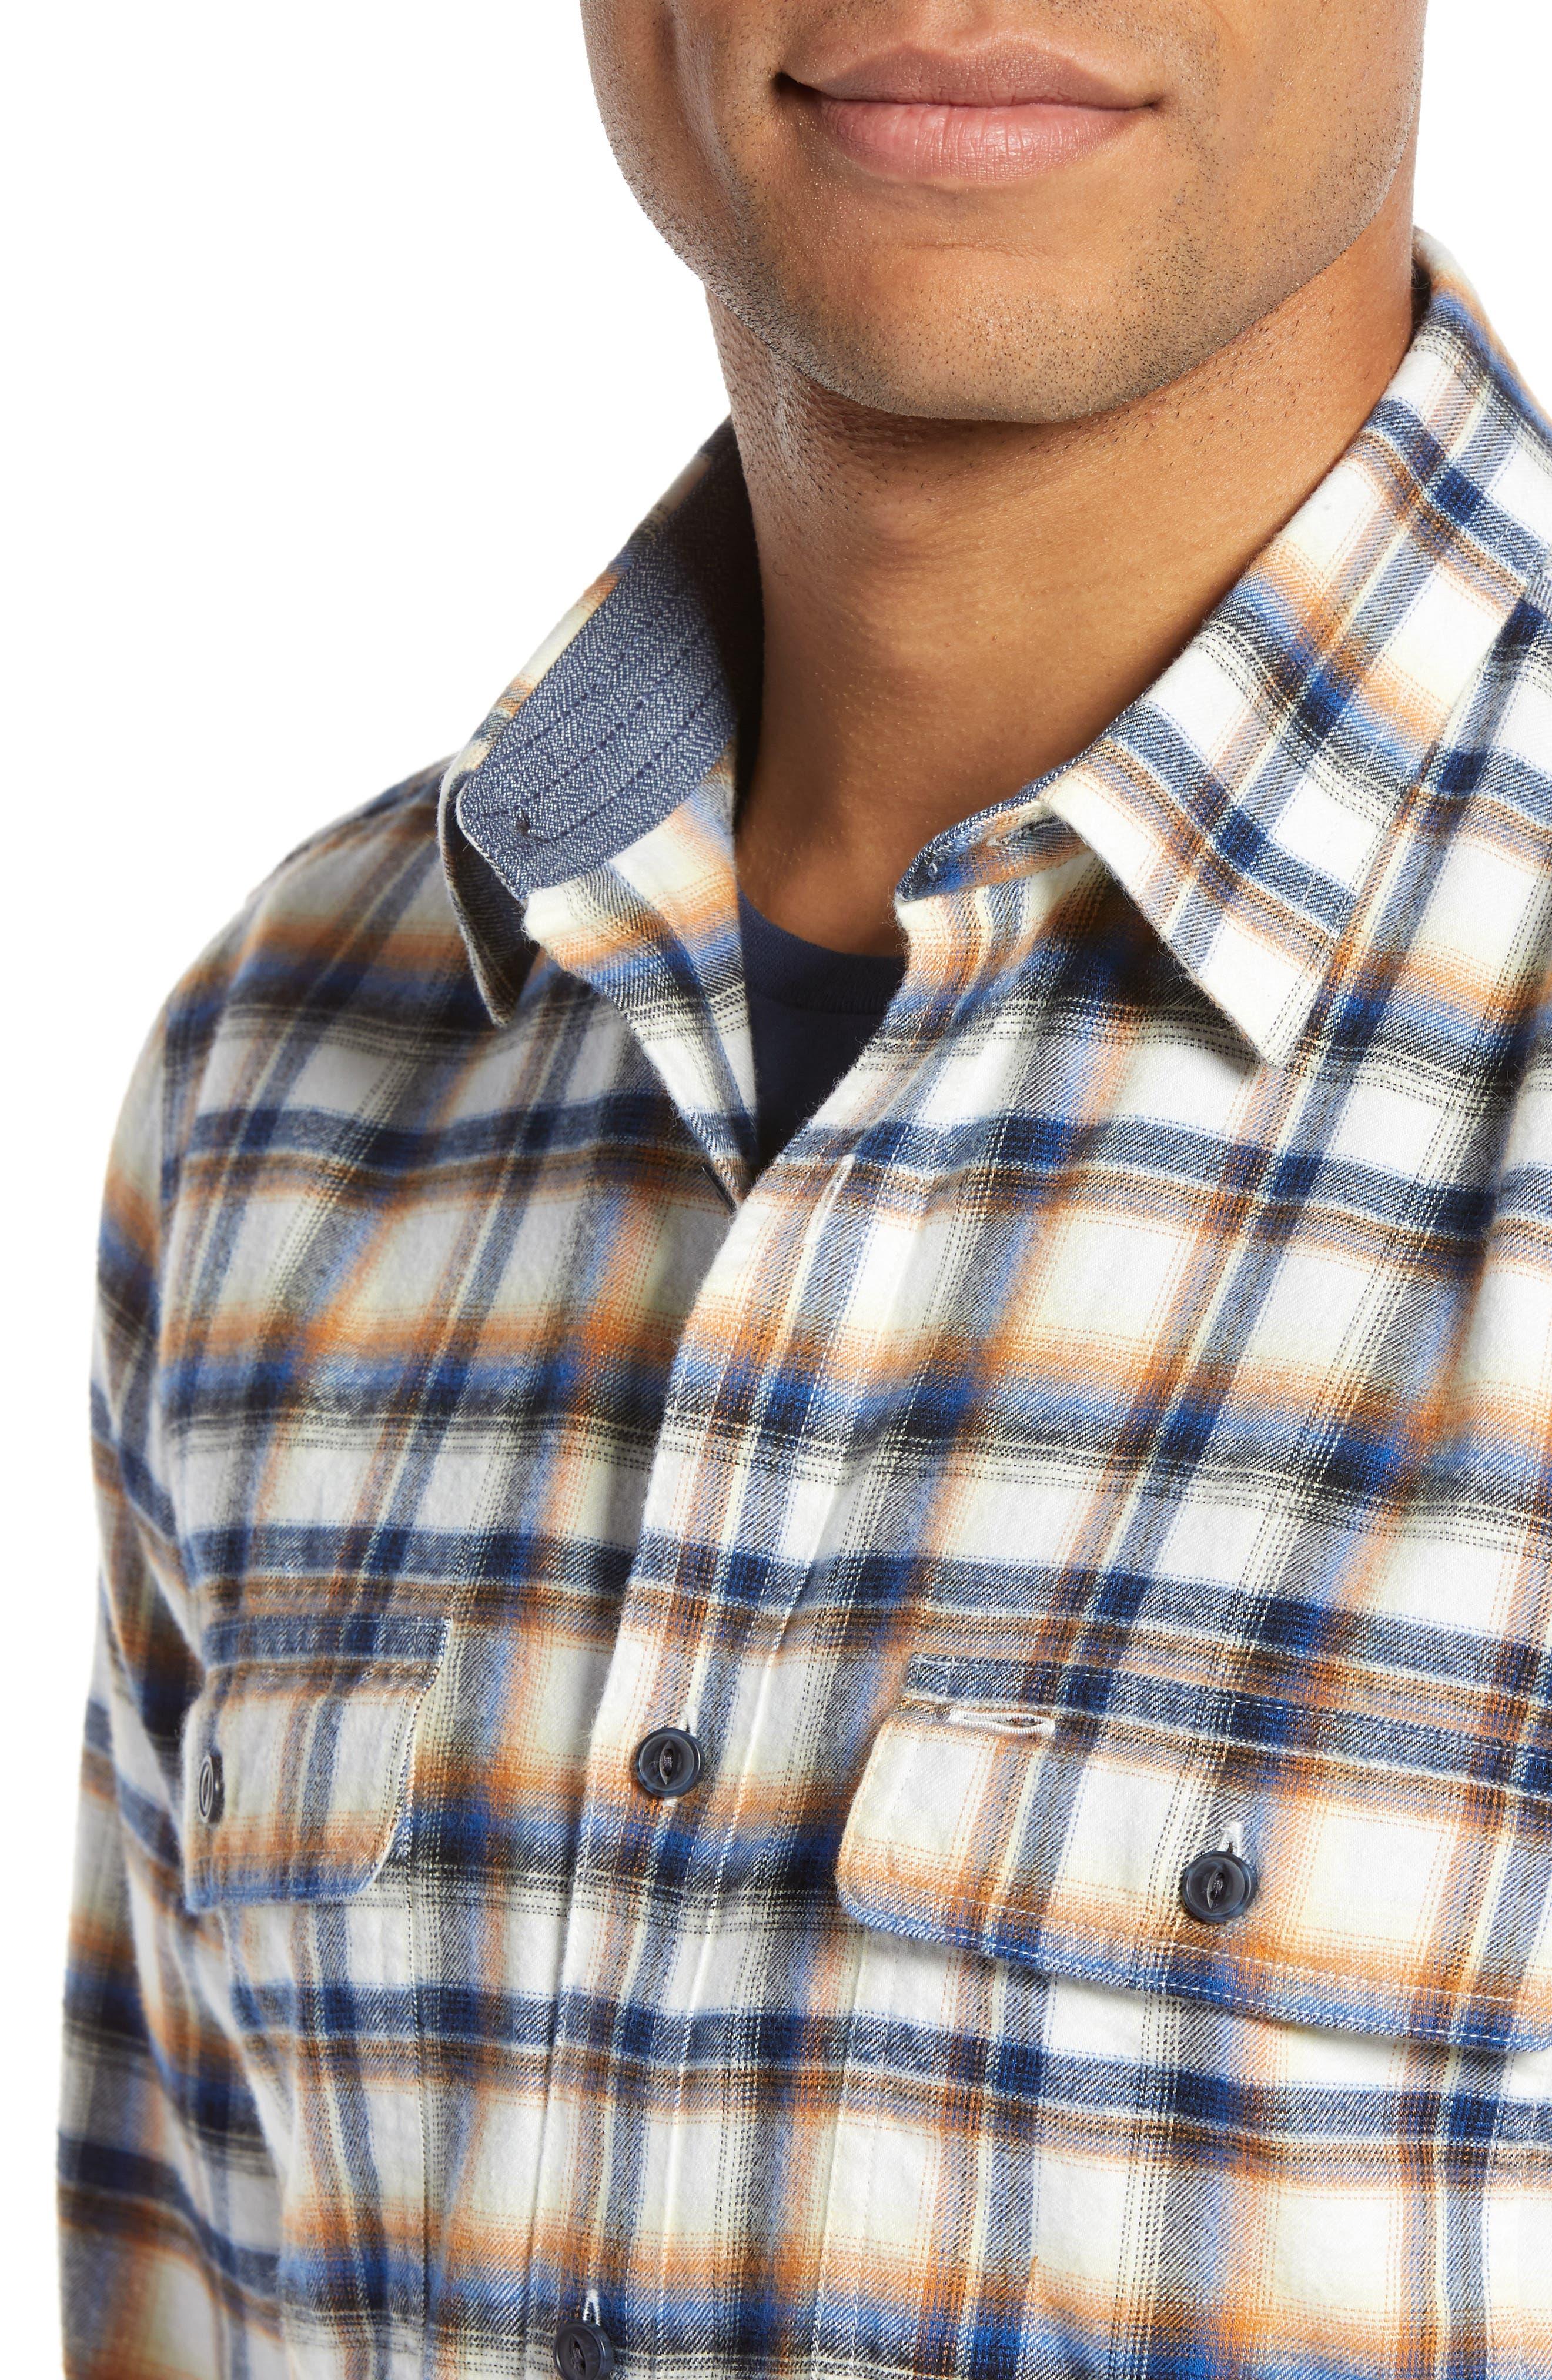 Trim Fit Trucker Plaid Sport Shirt,                             Alternate thumbnail 2, color,                             IVORY BLUE ORANGE PLAID